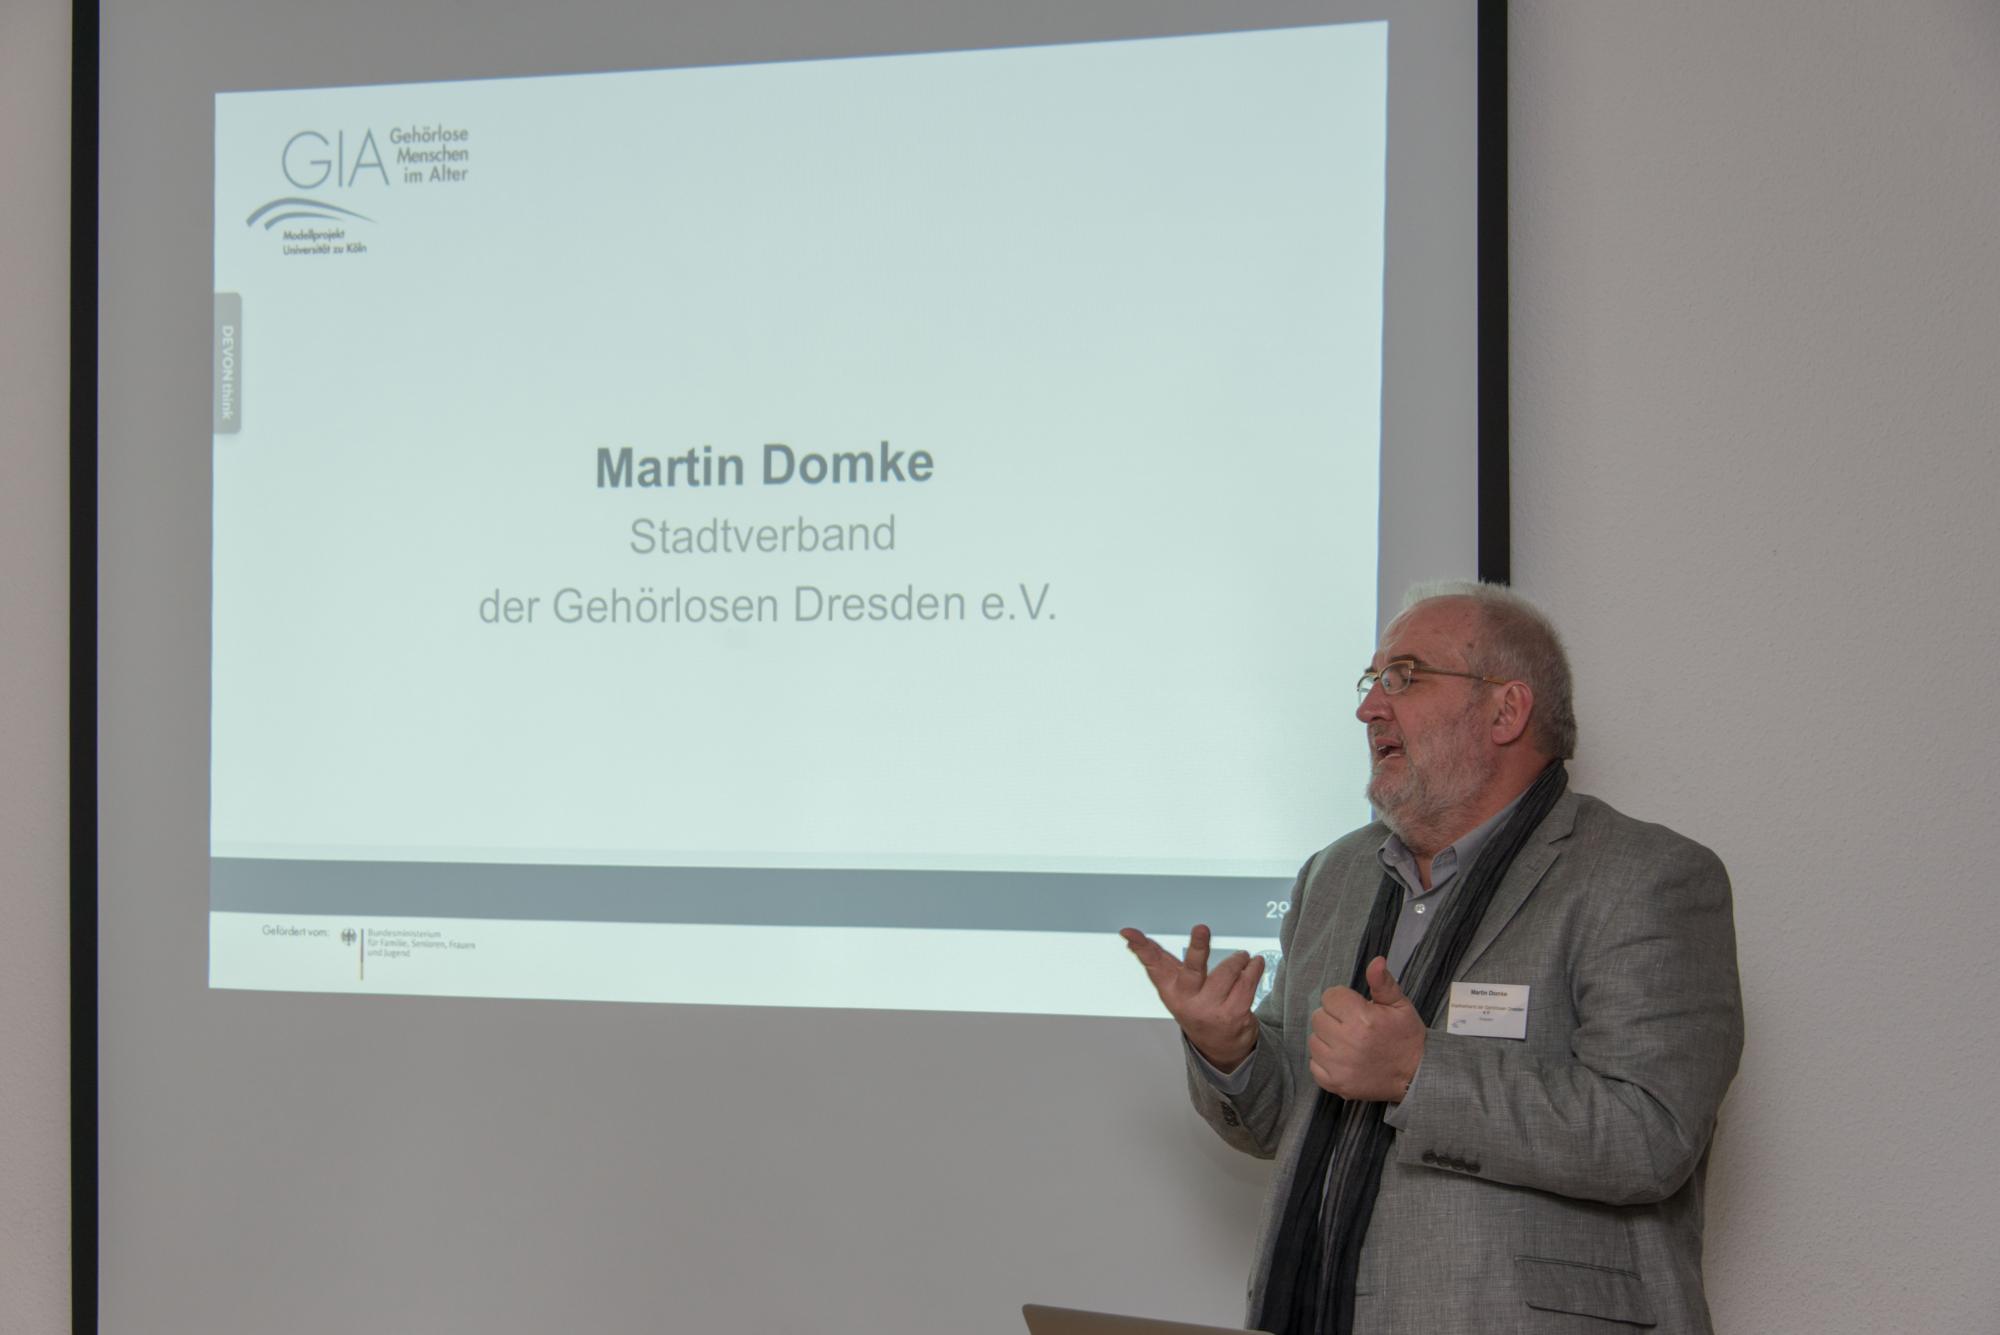 Martin Domke